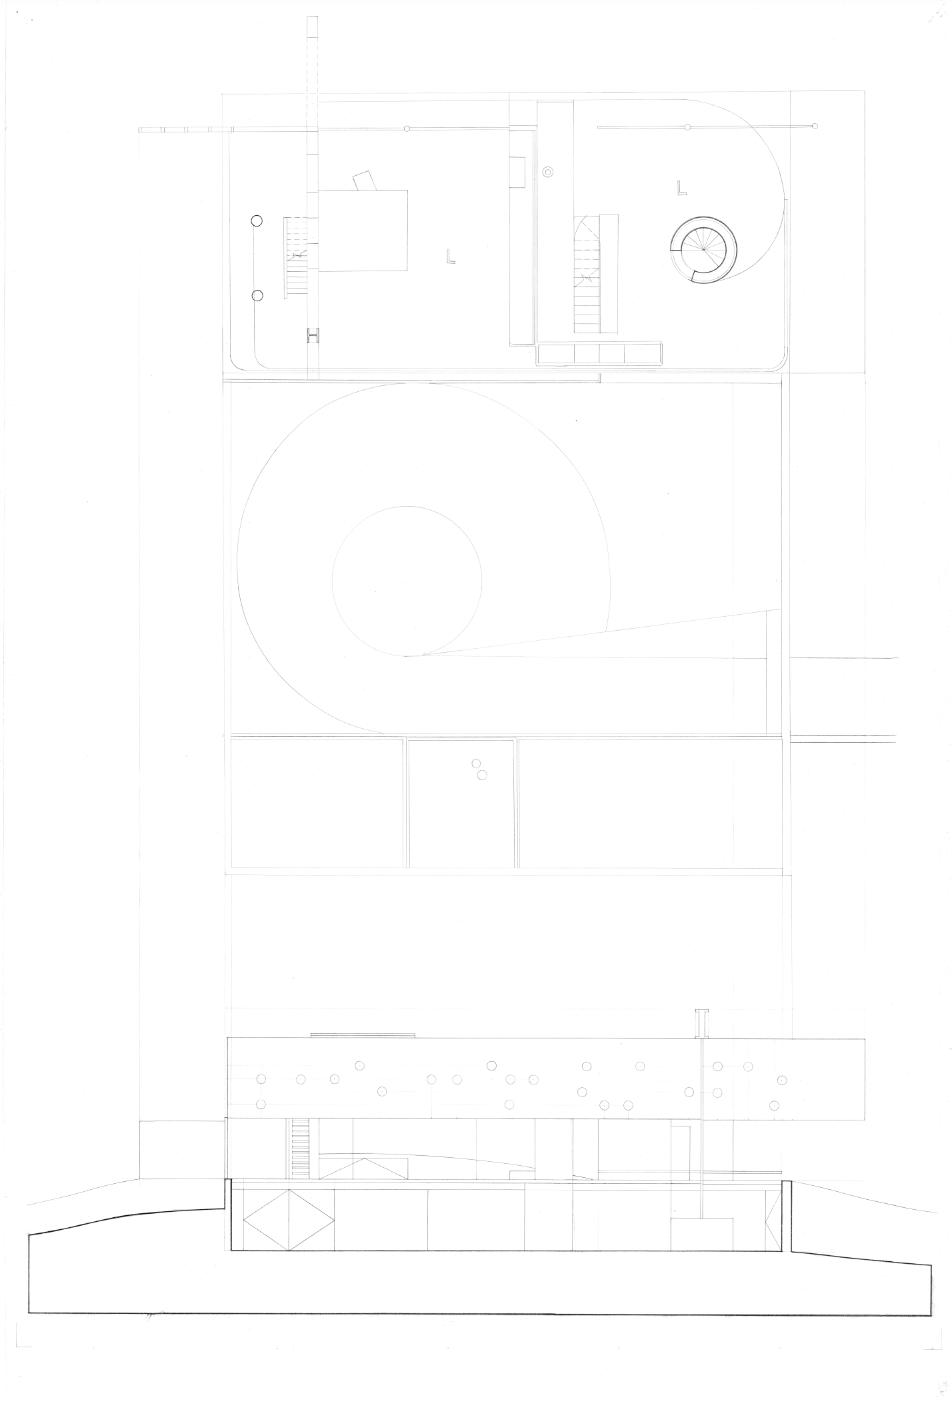 Second Floor Plan; Longitudinal Section